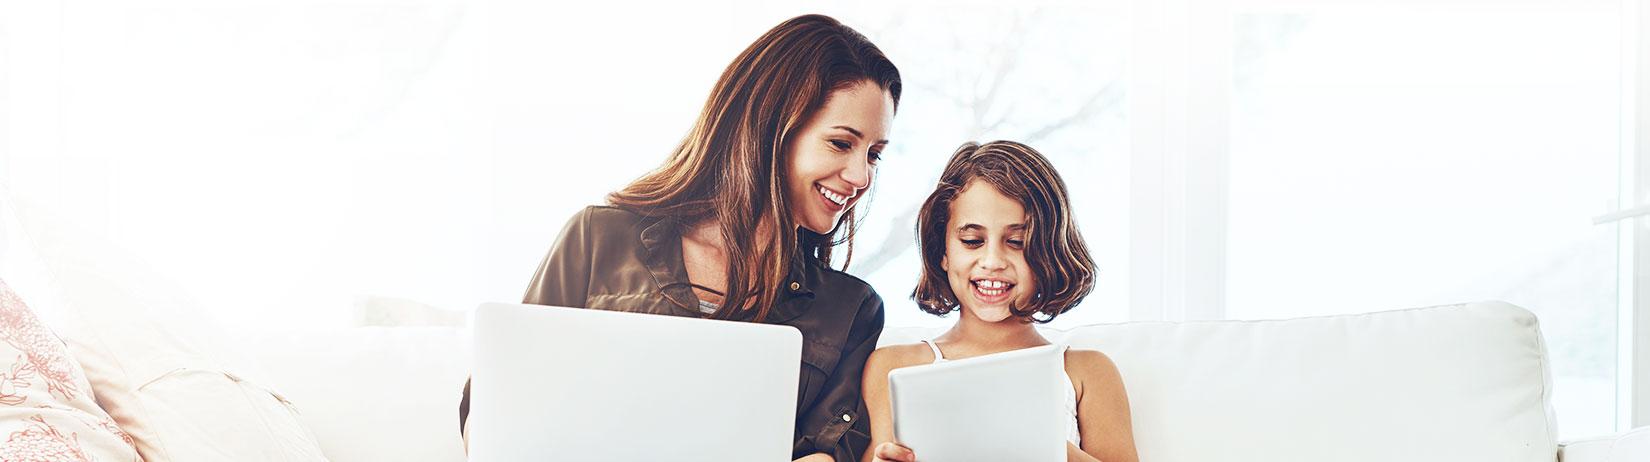 Rodzina i laptop